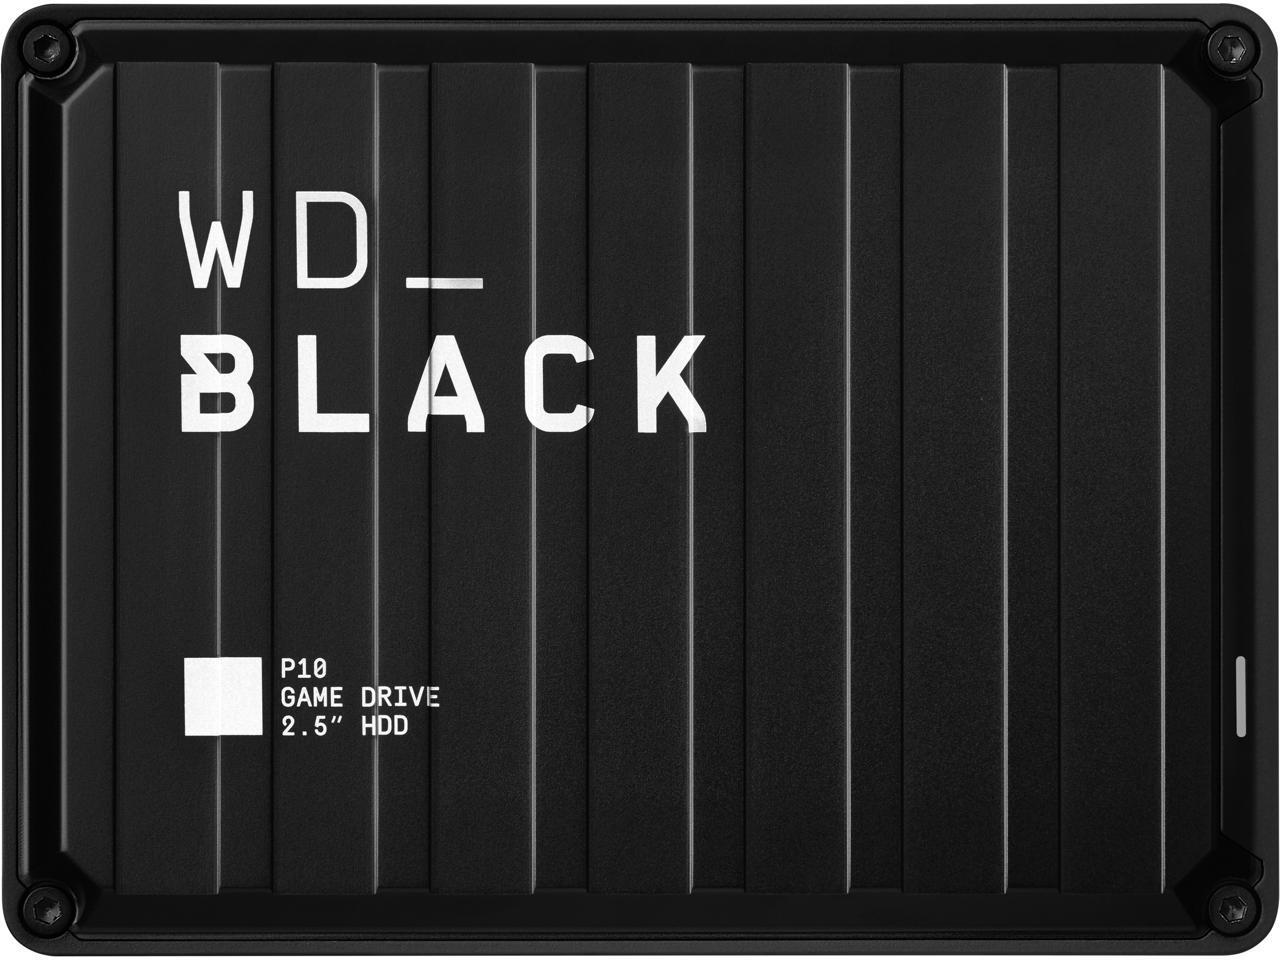 5TB WD Black P10 Game Drive Portable Hard Drive @Newegg $96